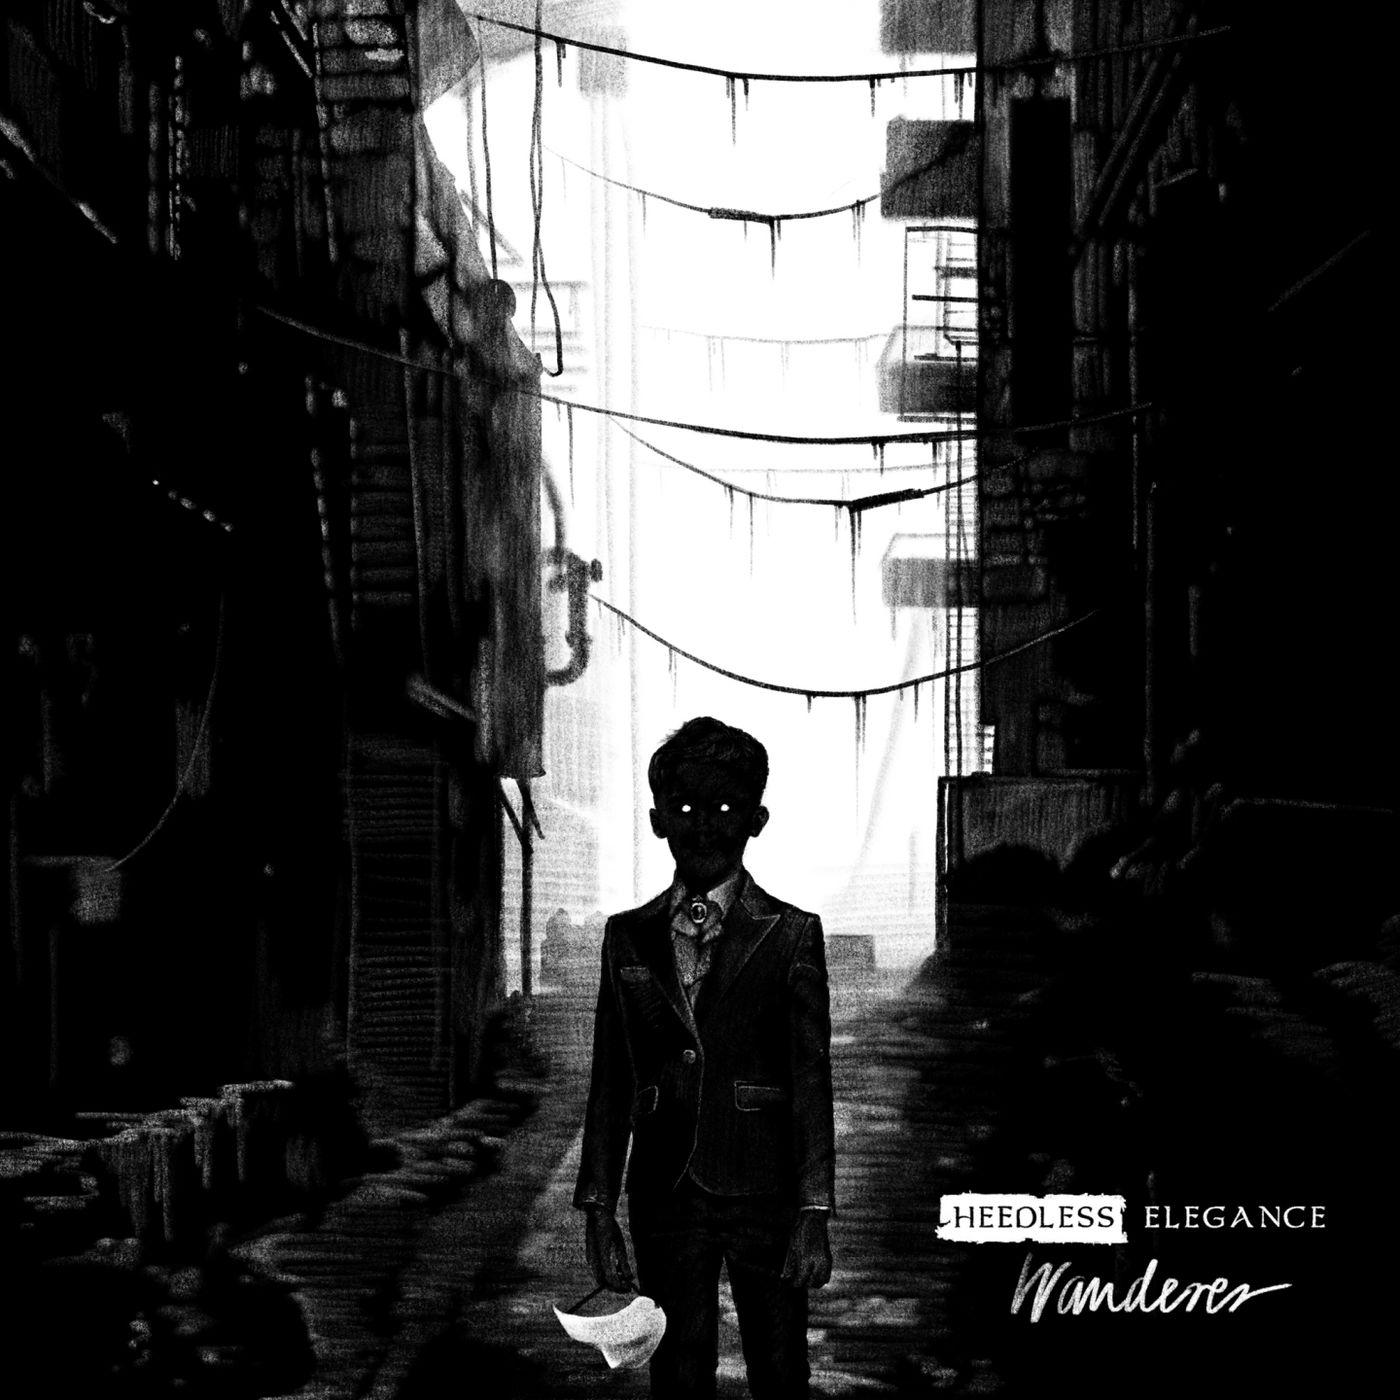 Heedless Elegance – Wanderer (2019)